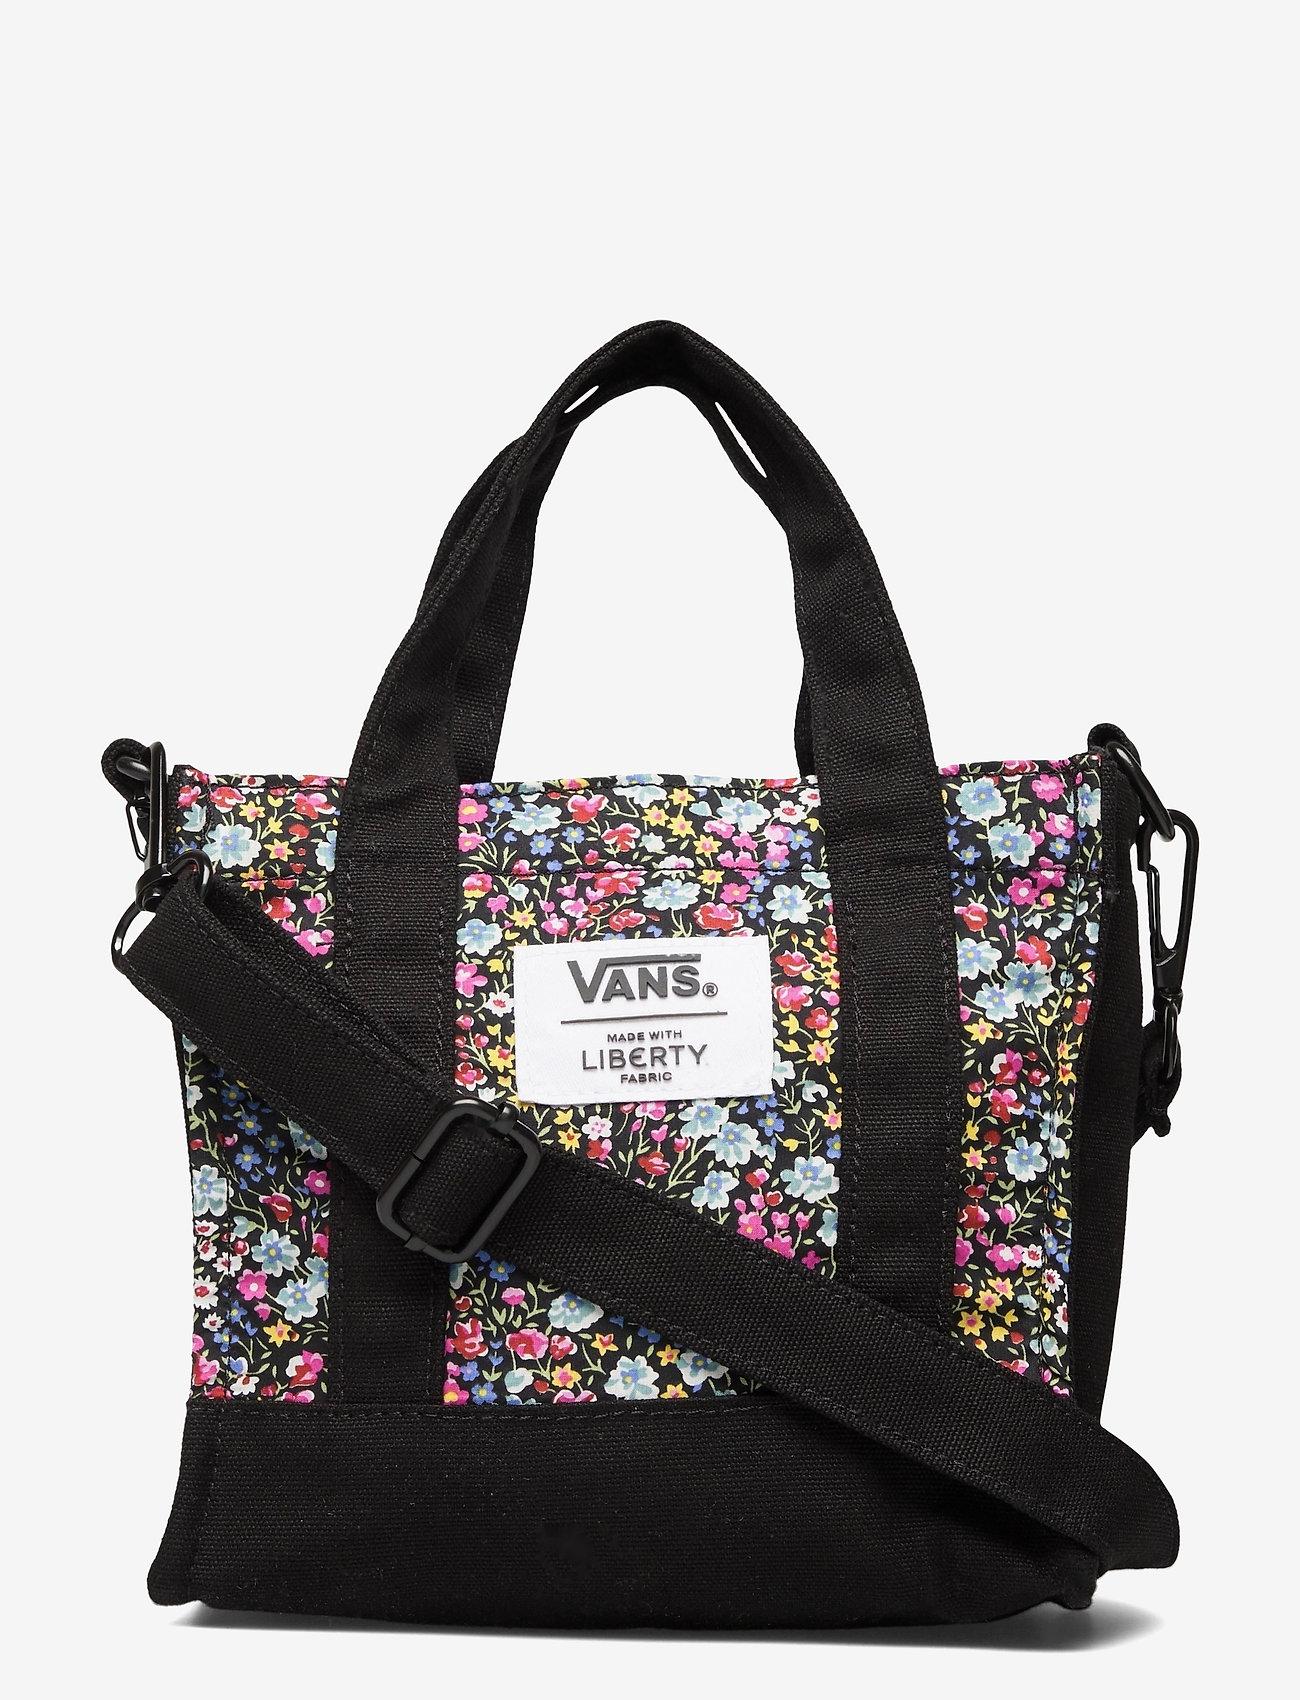 VANS - Bags Womens One - tote bags - (liberty fabric) black - 0